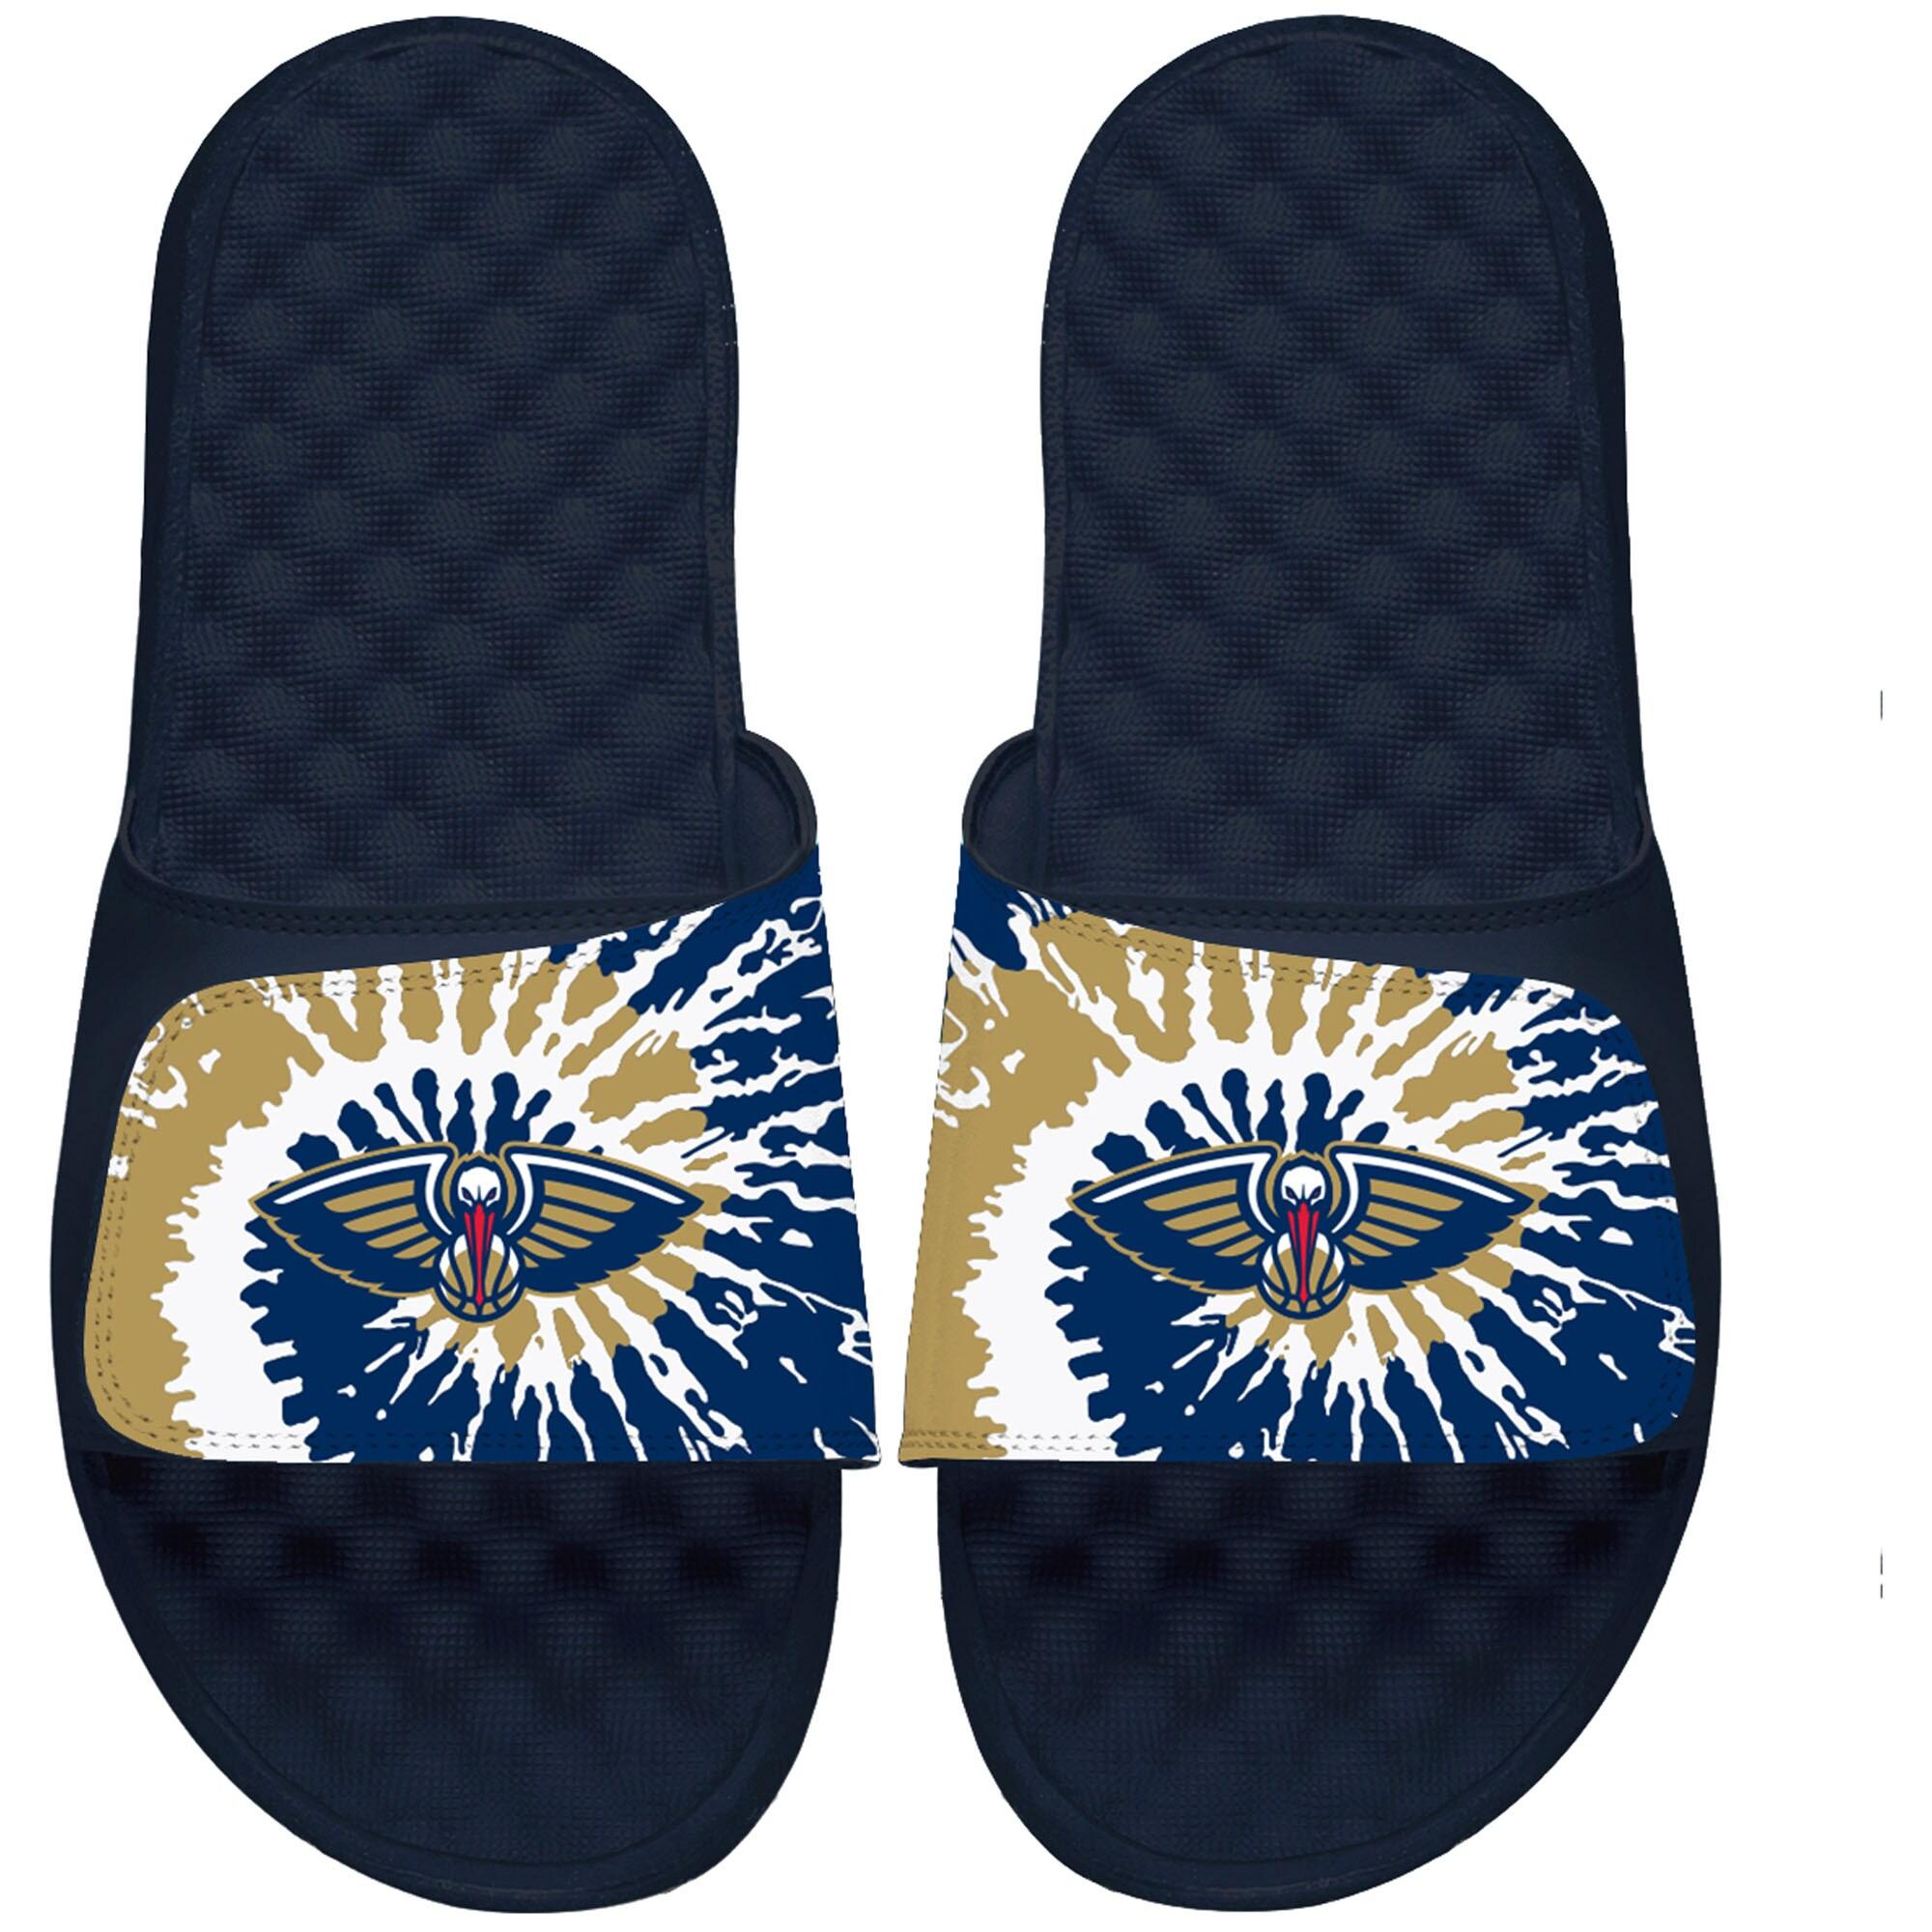 New Orleans Pelicans ISlide Tie Dye Slide Sandals - Navy